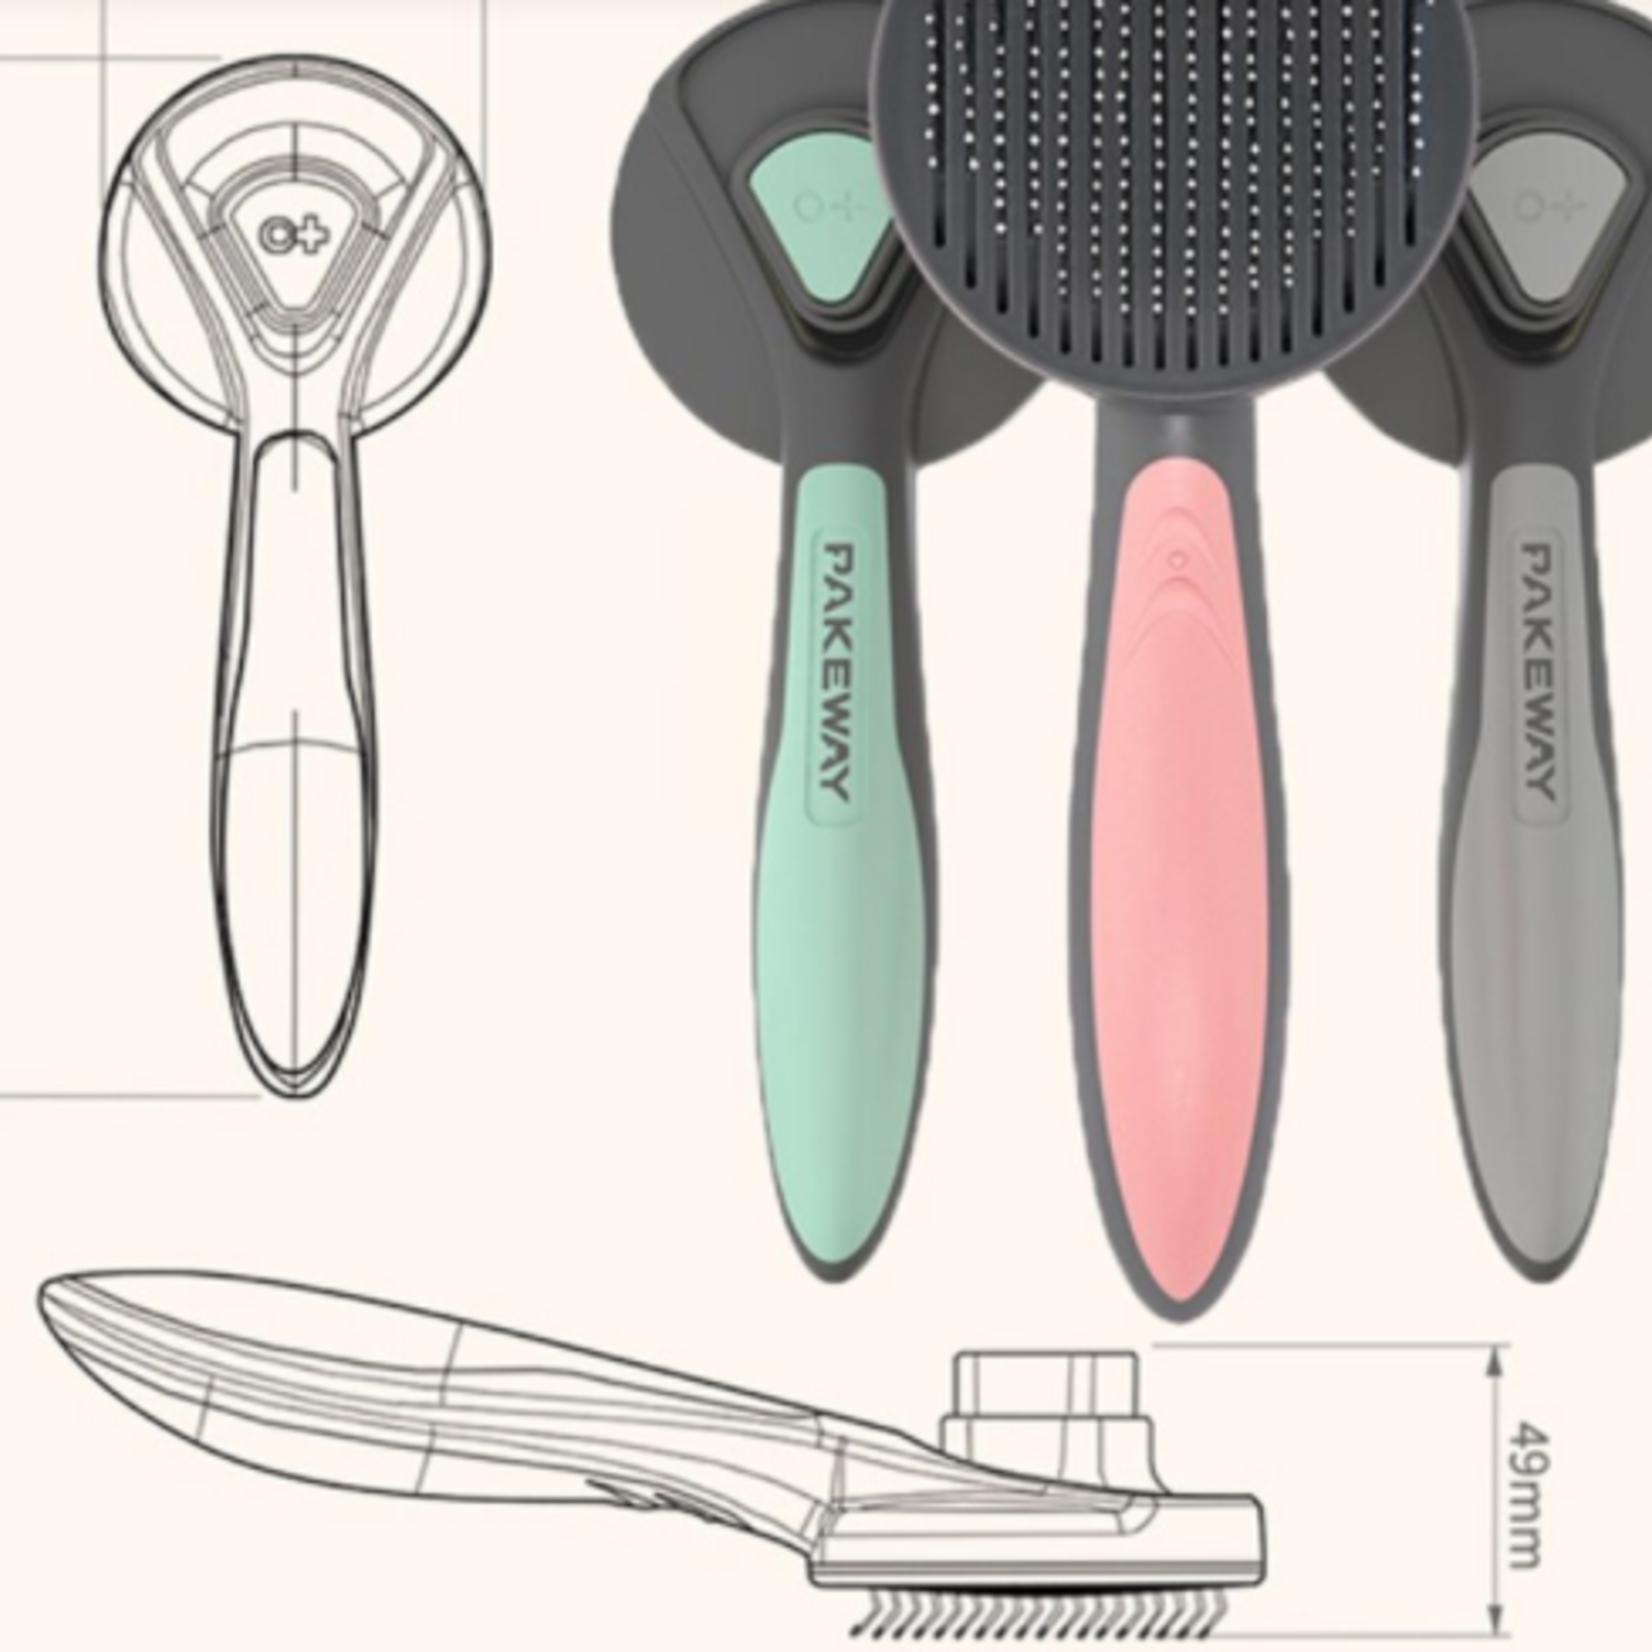 PAKEWAY Grooming Brush-T9Series-Short, Medium & Long Hair